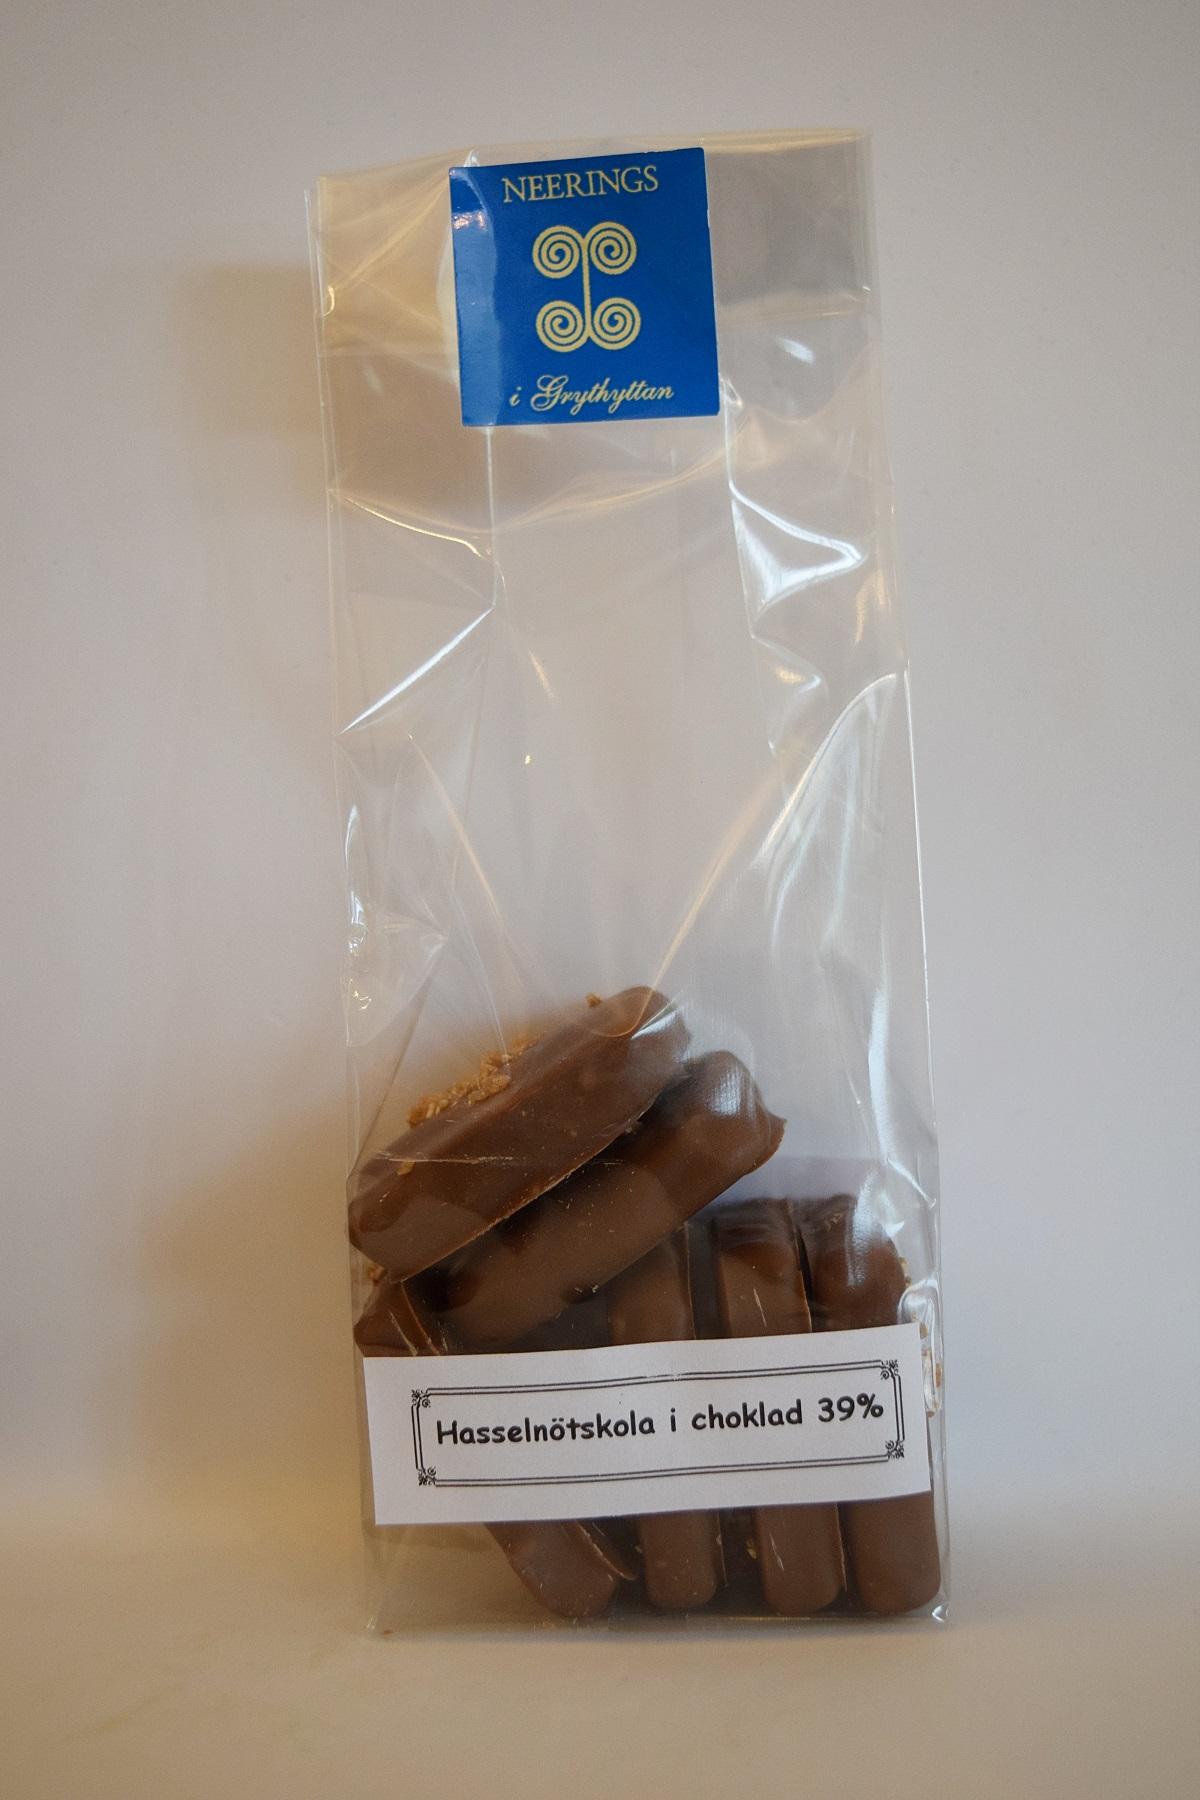 Vaniljkola i 39% choklad